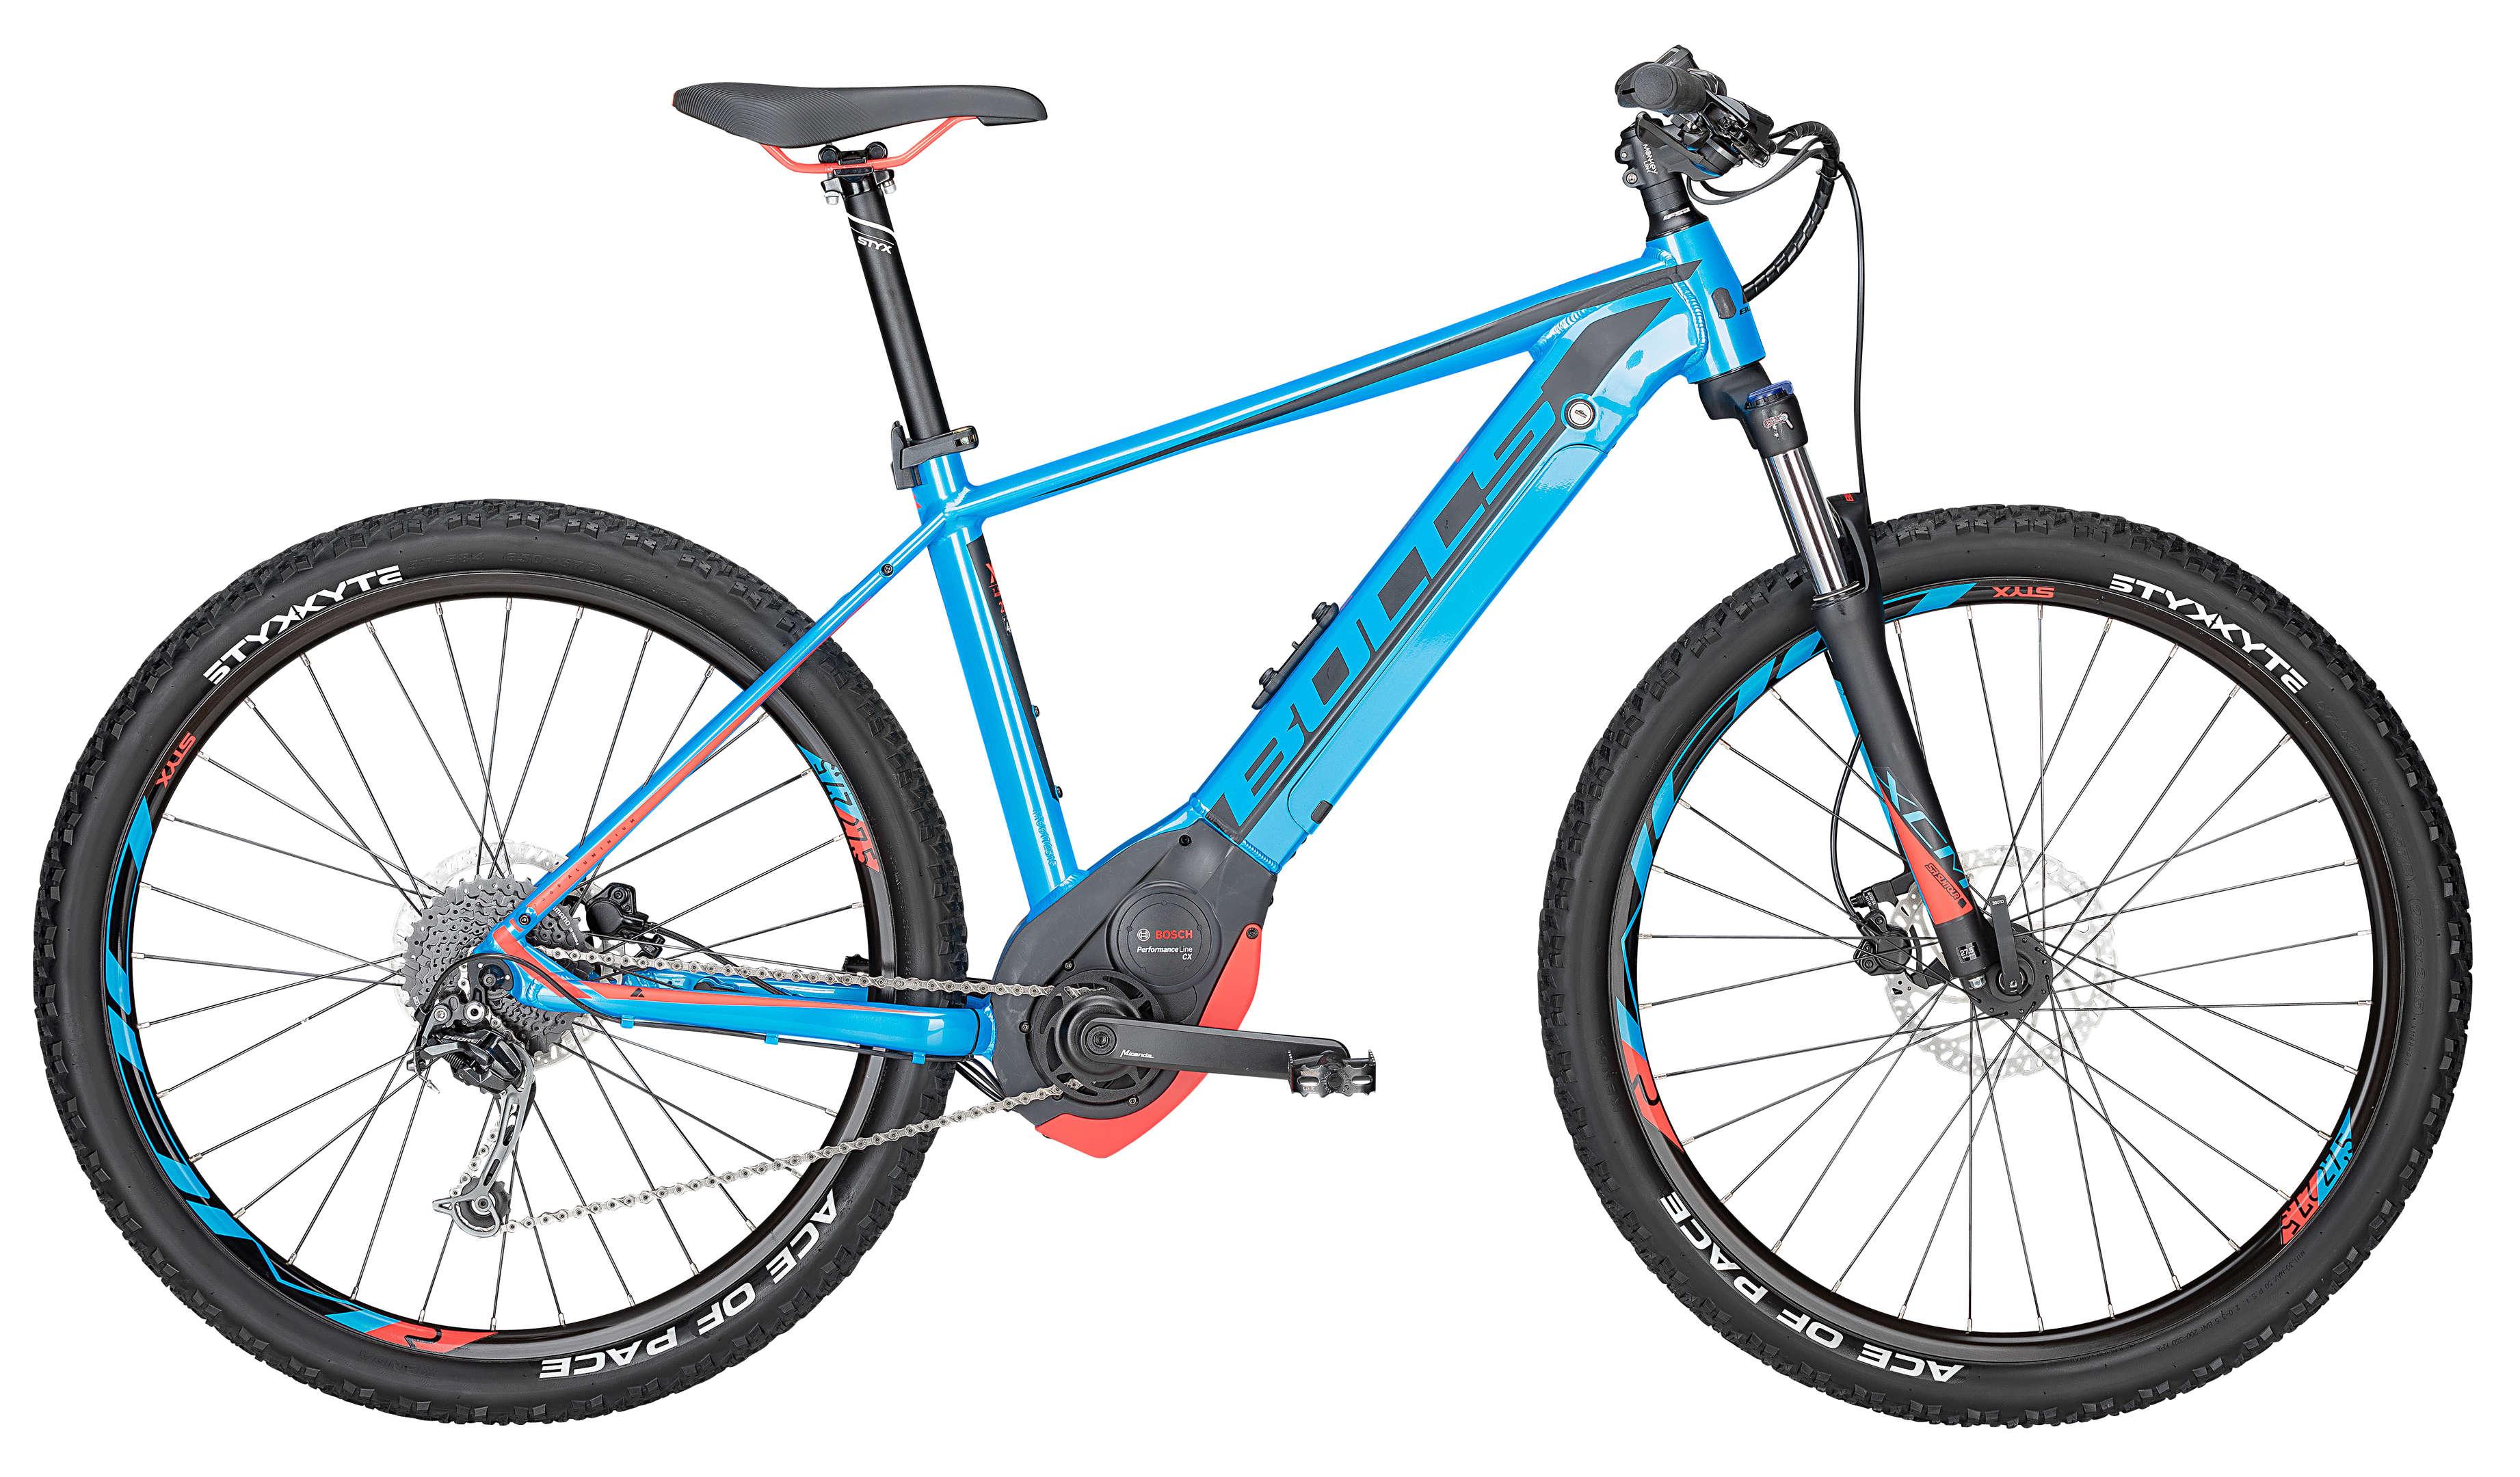 BULLS E-Bike Six50 Evo 1 CX